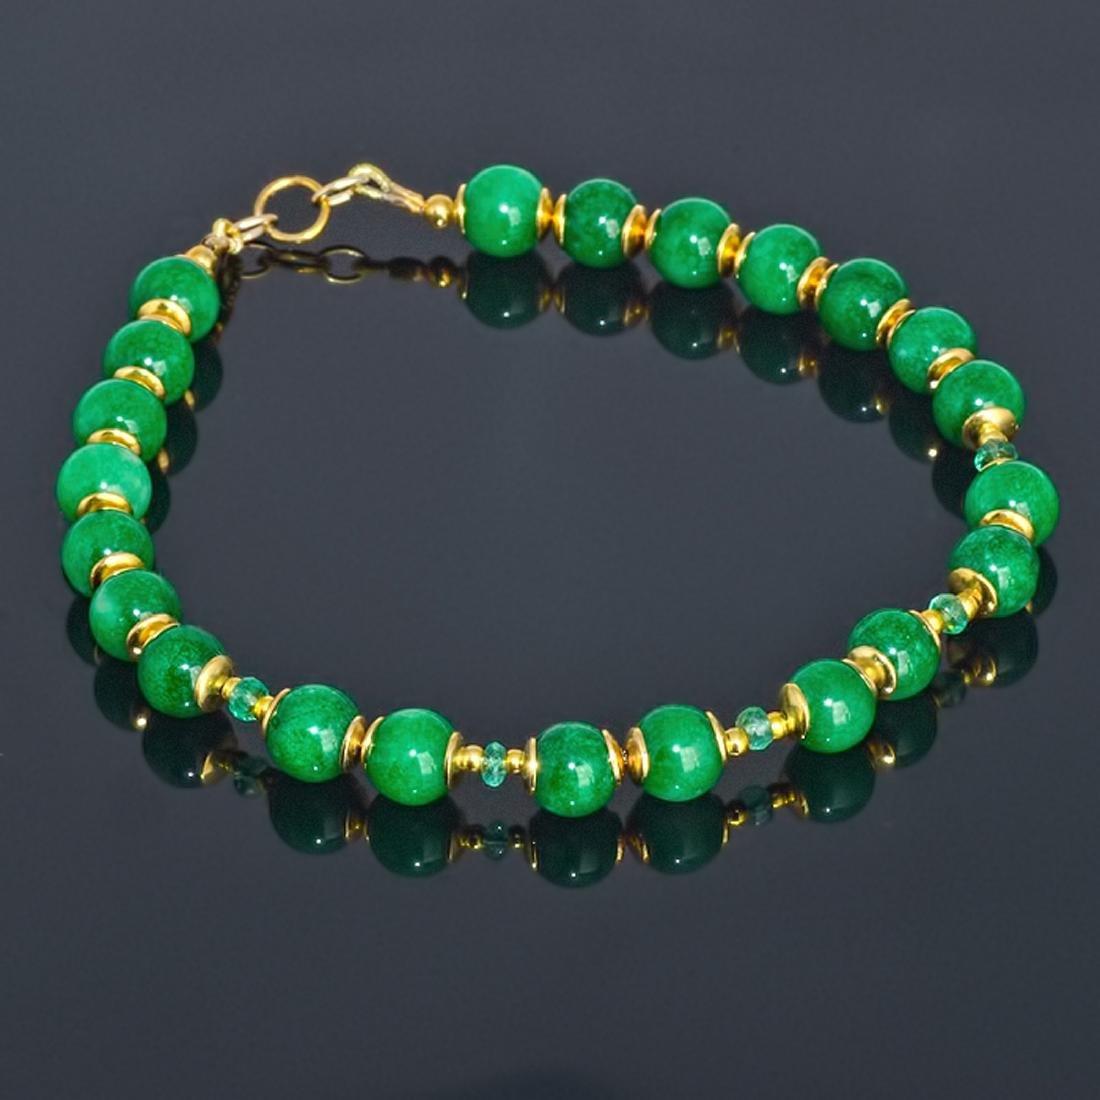 14K Gold Imperial Emerald Green Jade Bracelet - 7